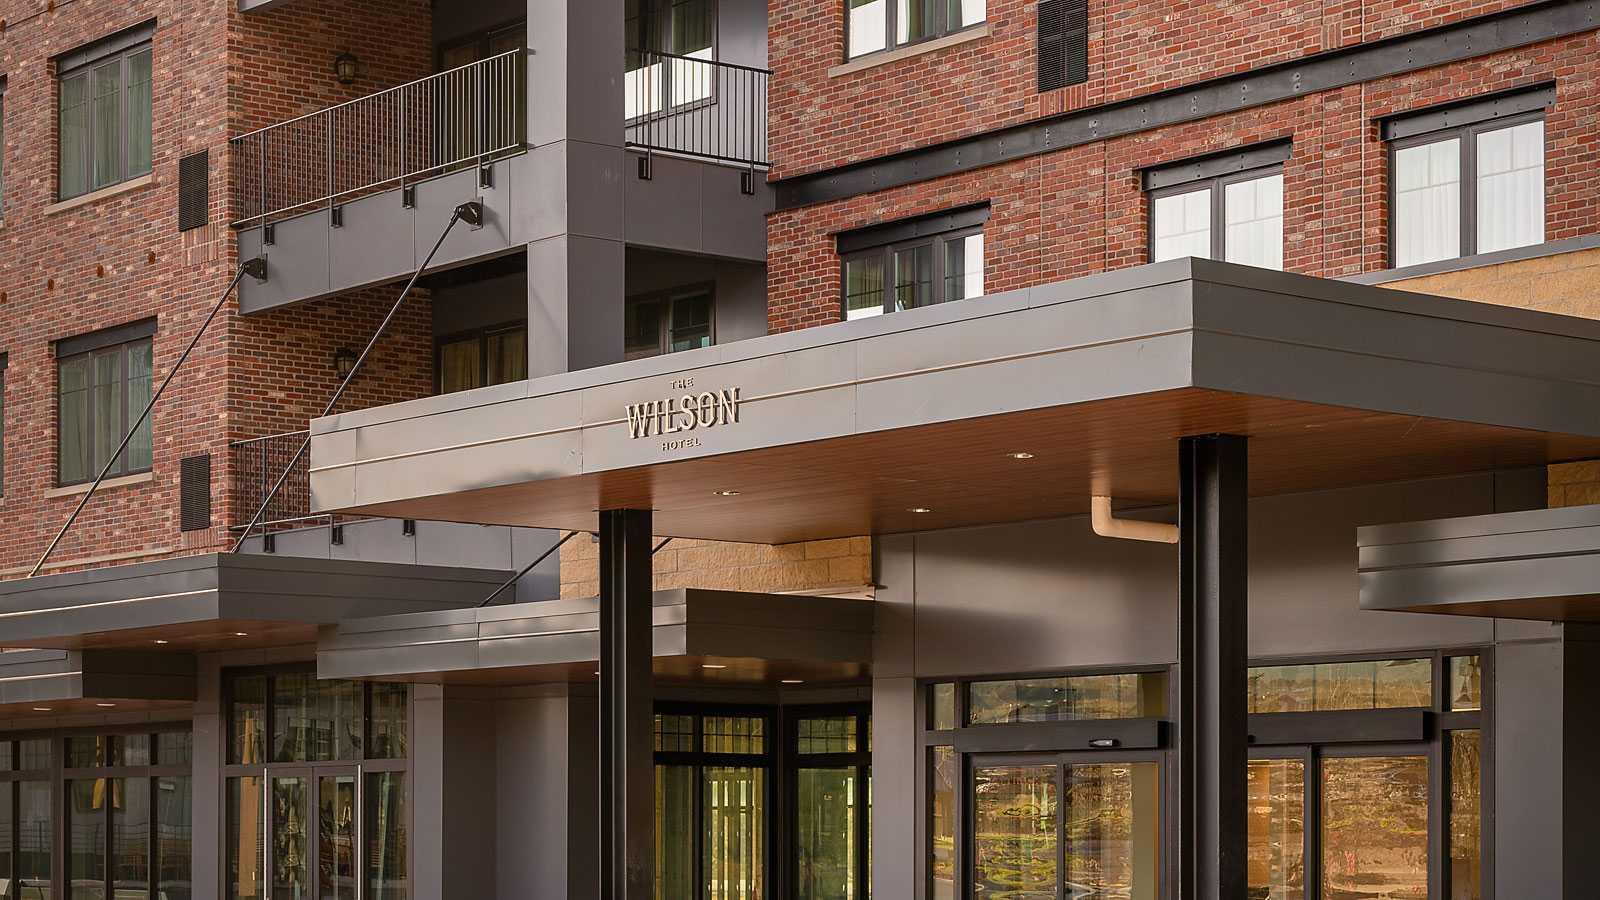 Wilson_Hotel6